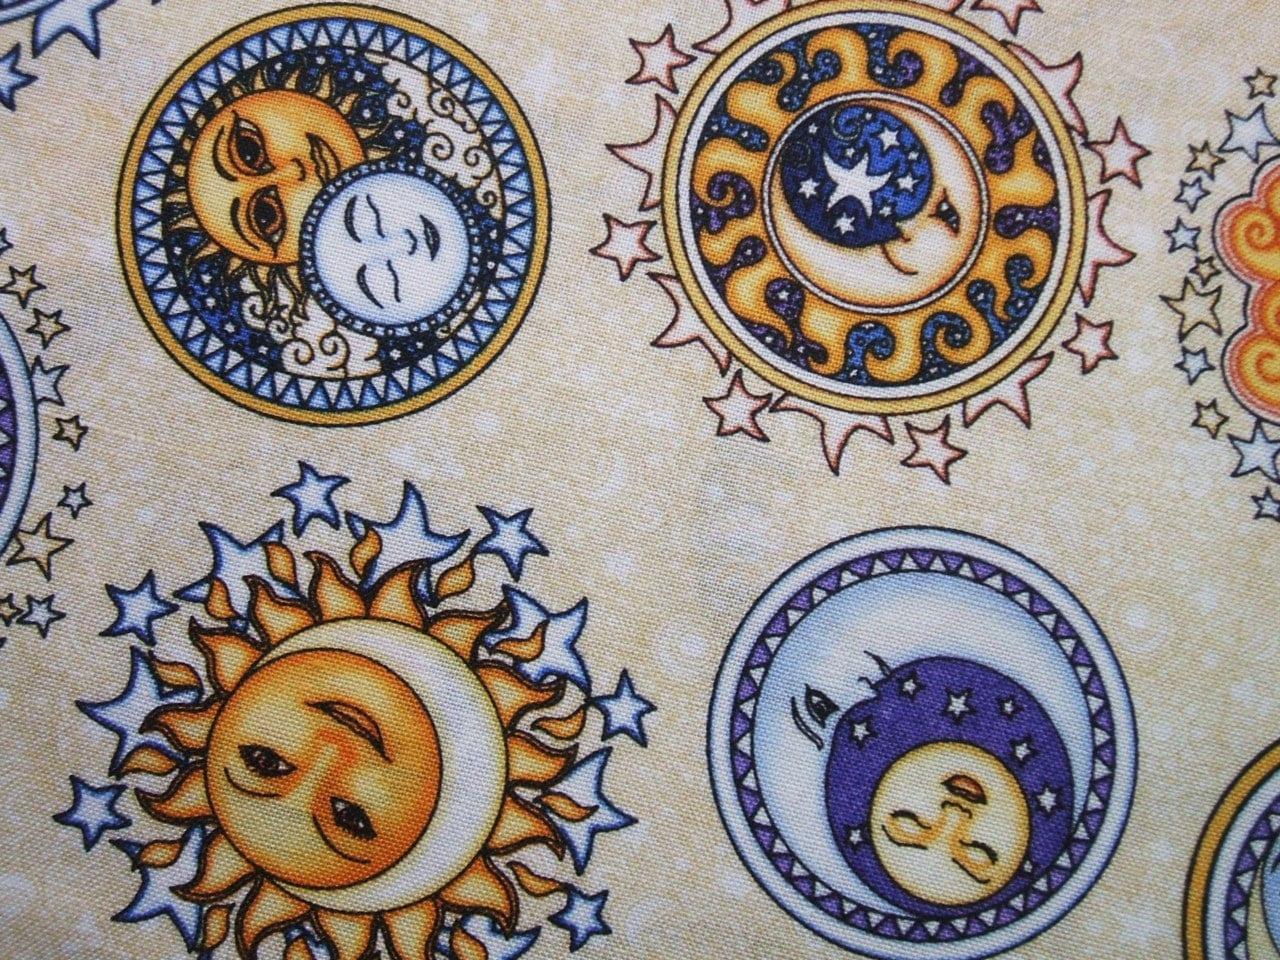 Rjr sew heavenly cream celestial sun moon stars fabric yard for Sun moon and stars fabric